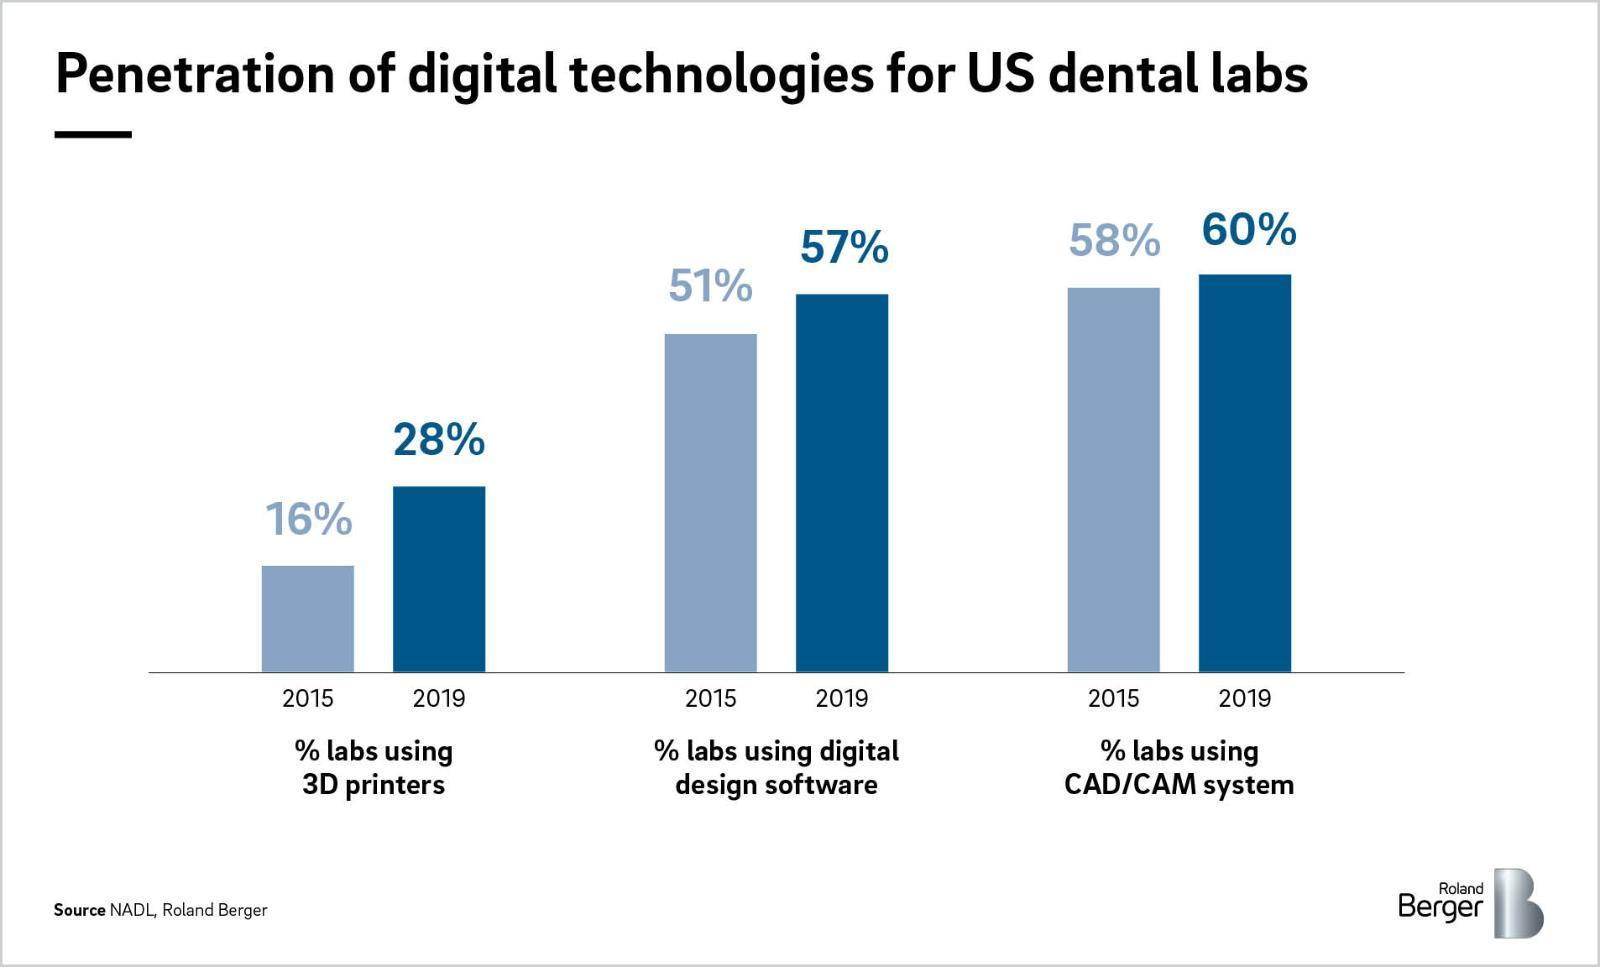 Penetration of digital technology